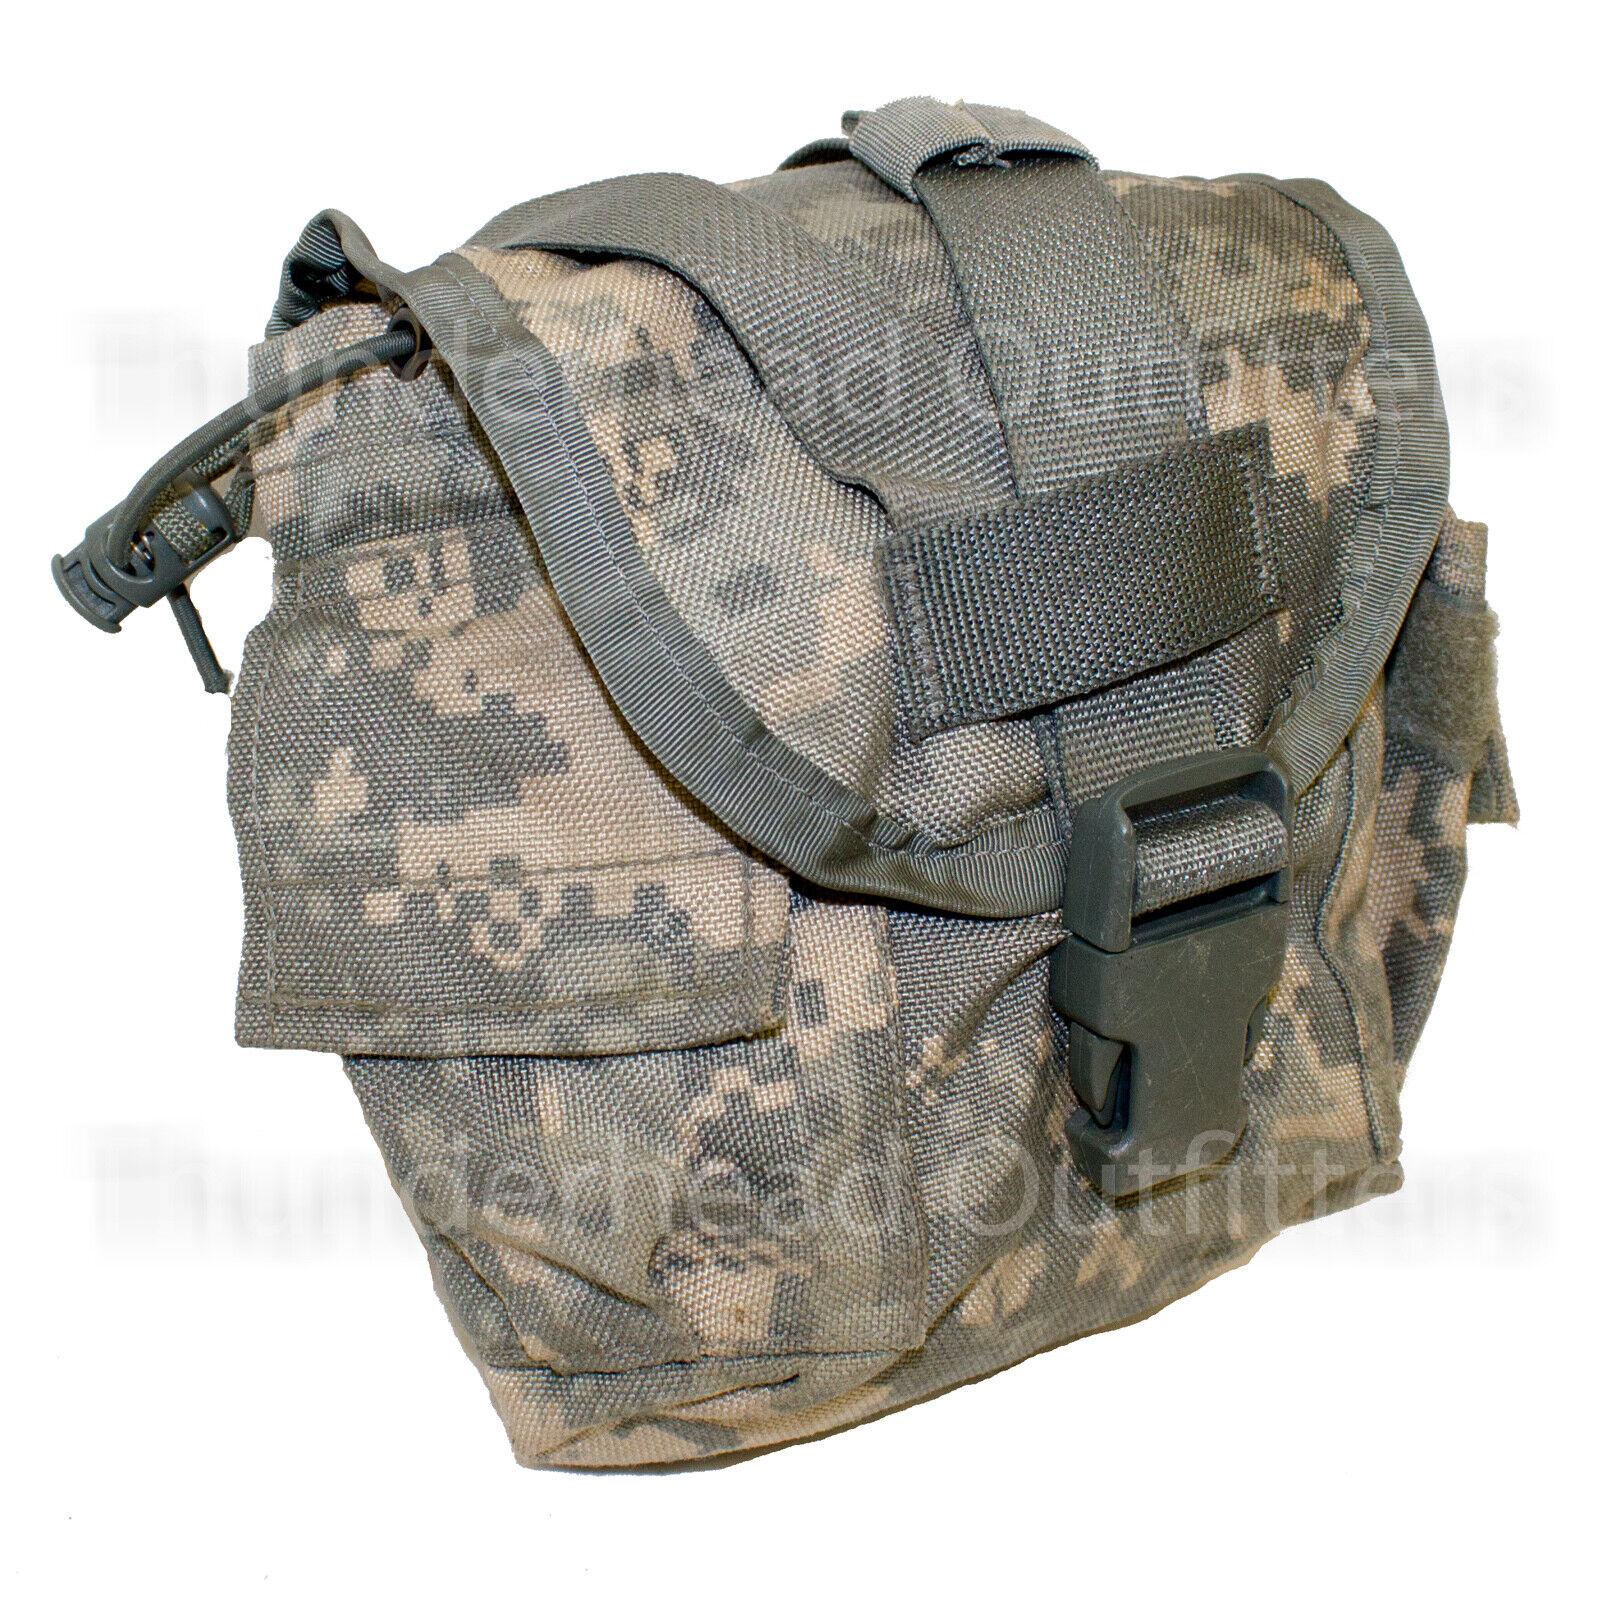 USGI US Army MOLLE ACU Digital 1 QT CANTEEN POUCH Utility Cover 1 Quart CIF